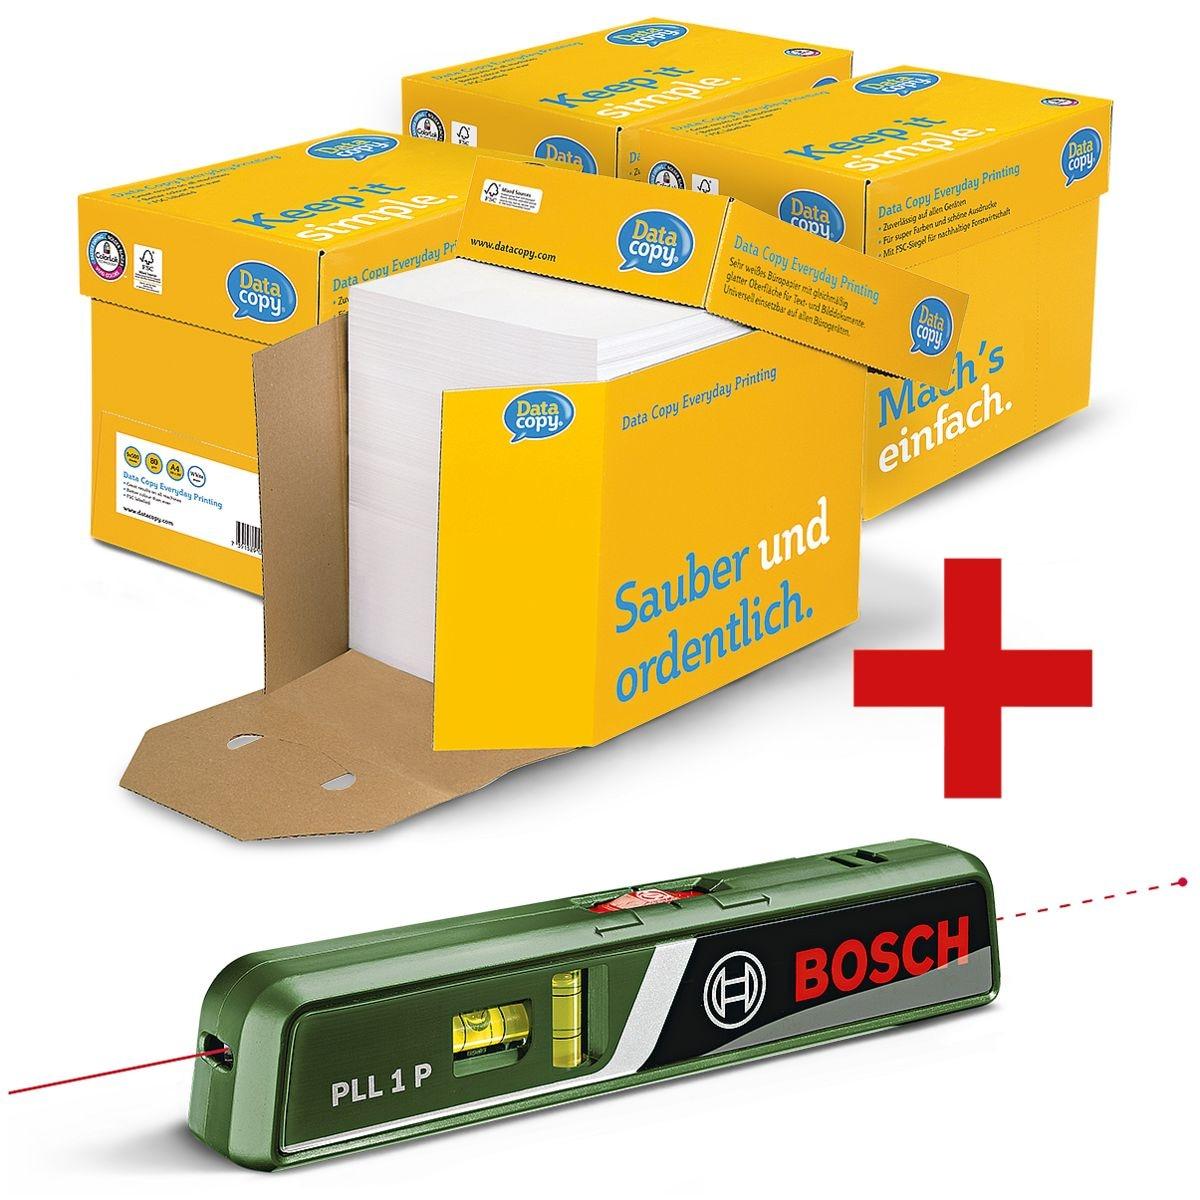 4x Öko-Box Multifunktionales Druckerpapier A4 Data-Copy Everyday Printing - 10000 Blatt gesamt inkl. Laser-Wasserwaage »PLL 1 P«